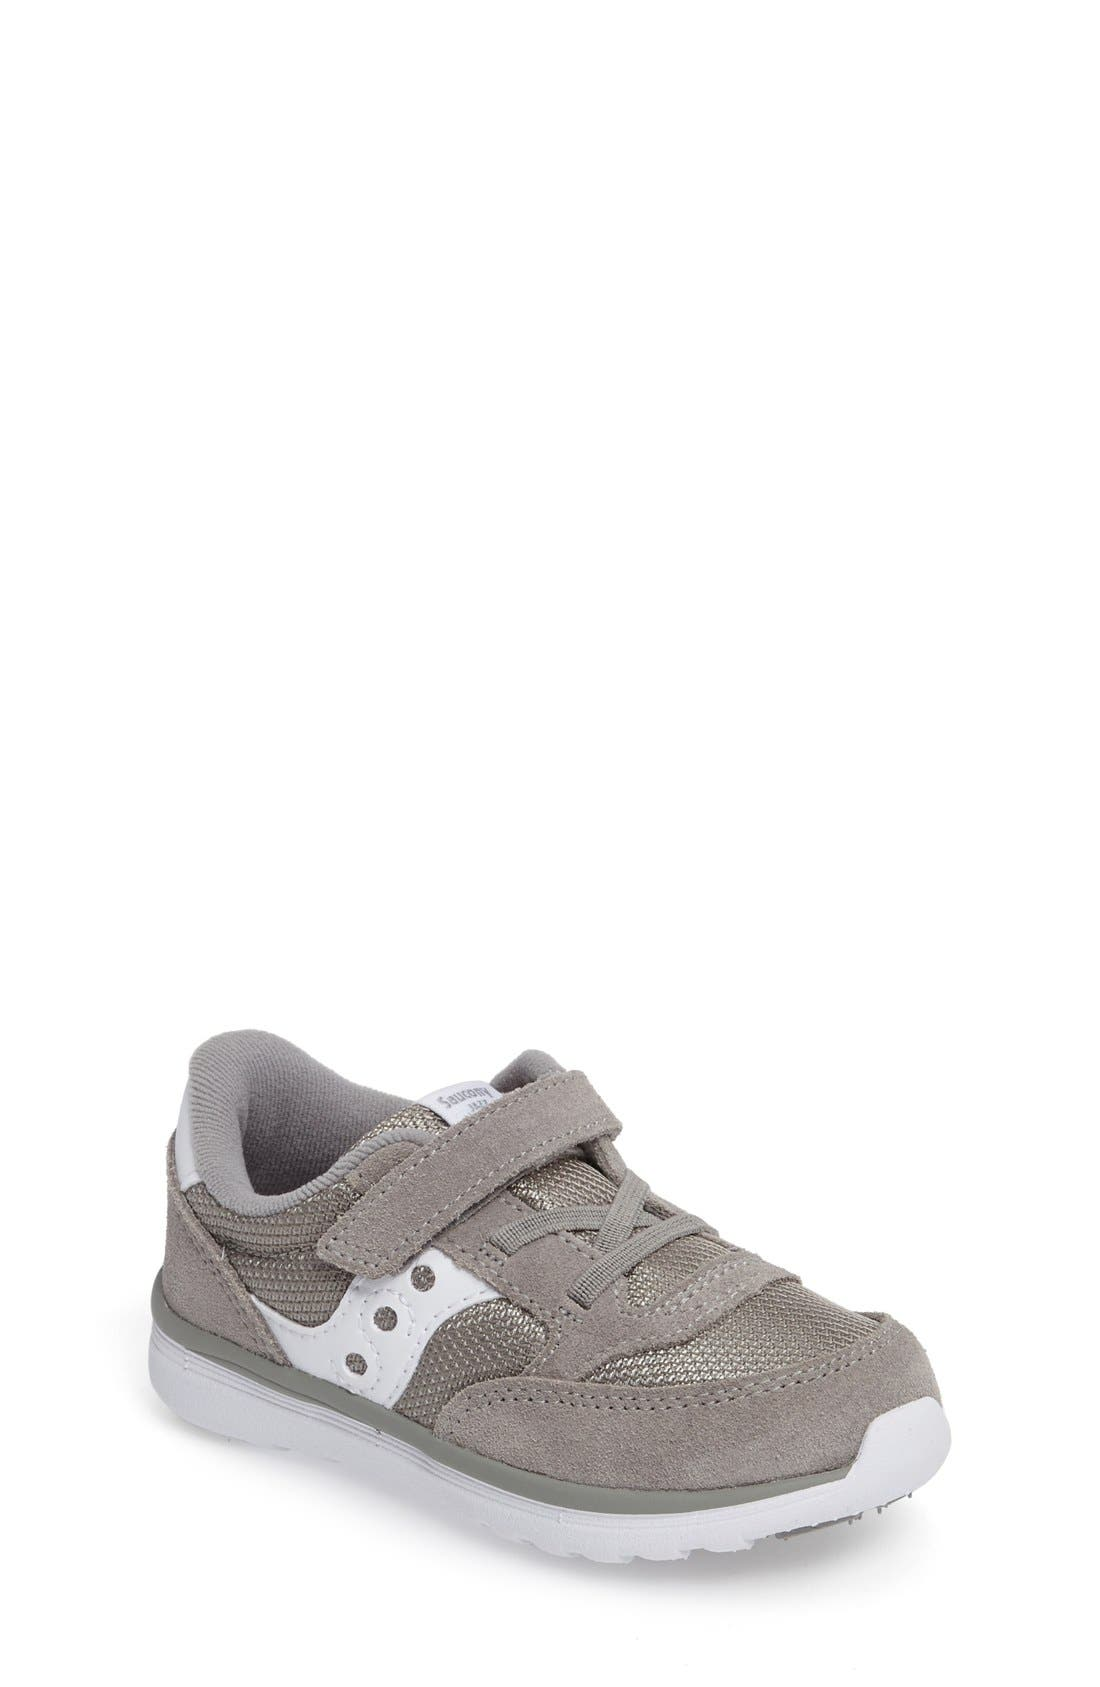 Jazz Lite Sneaker,                             Main thumbnail 1, color,                             Grey/ White